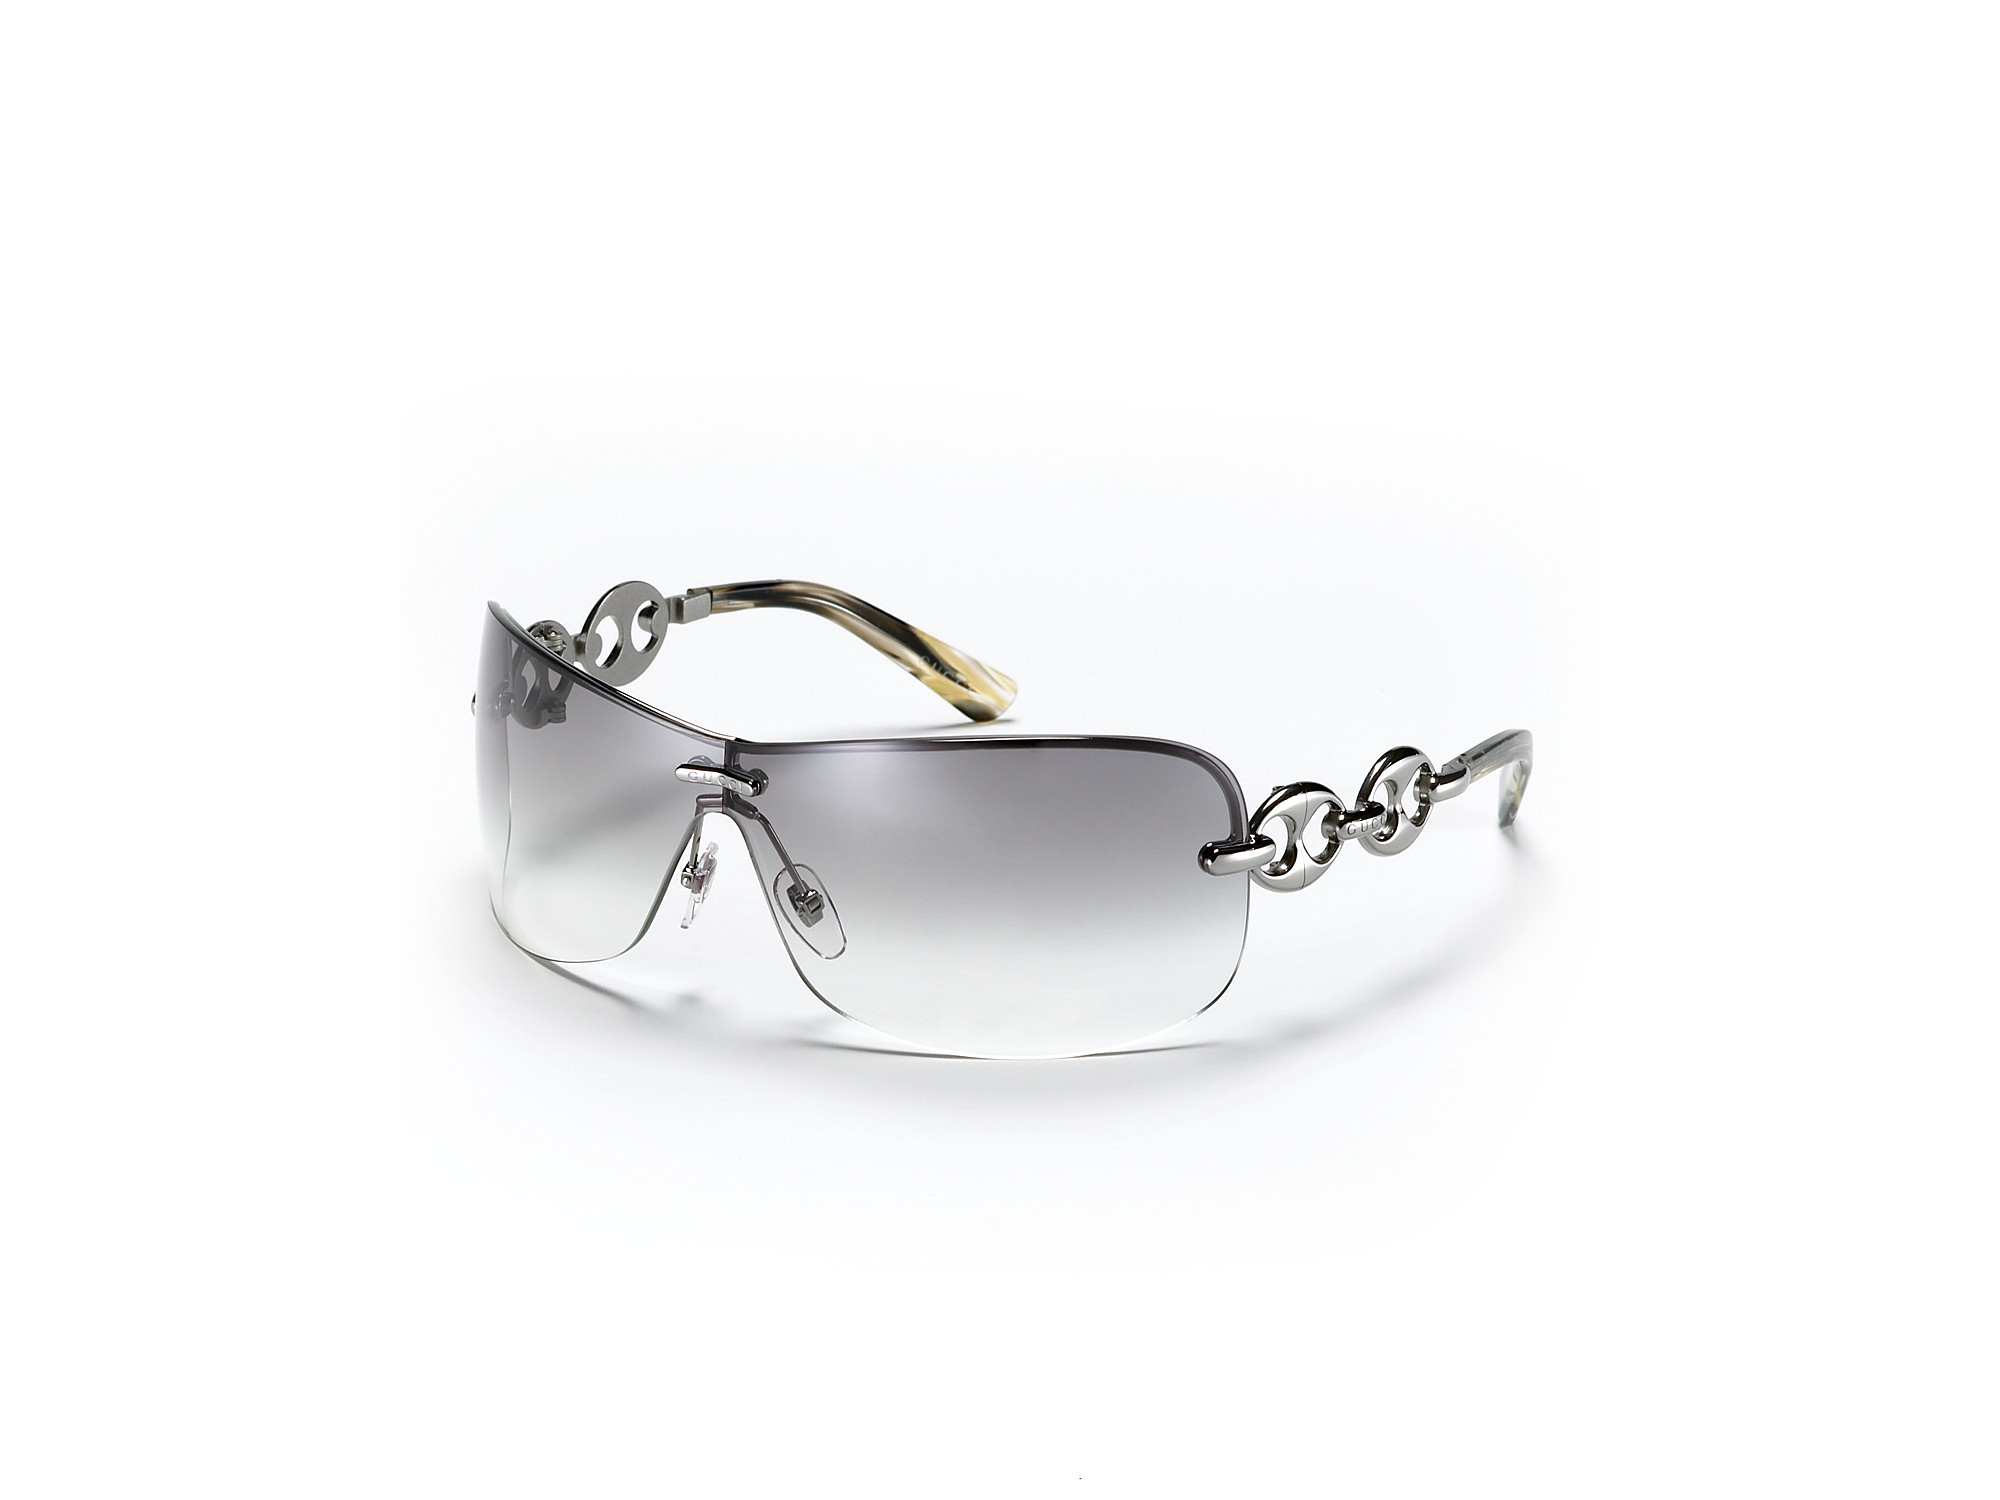 076e115b31b5 Gucci Rimless Shield Sunglasses with Chain Link Design in Brown - Lyst